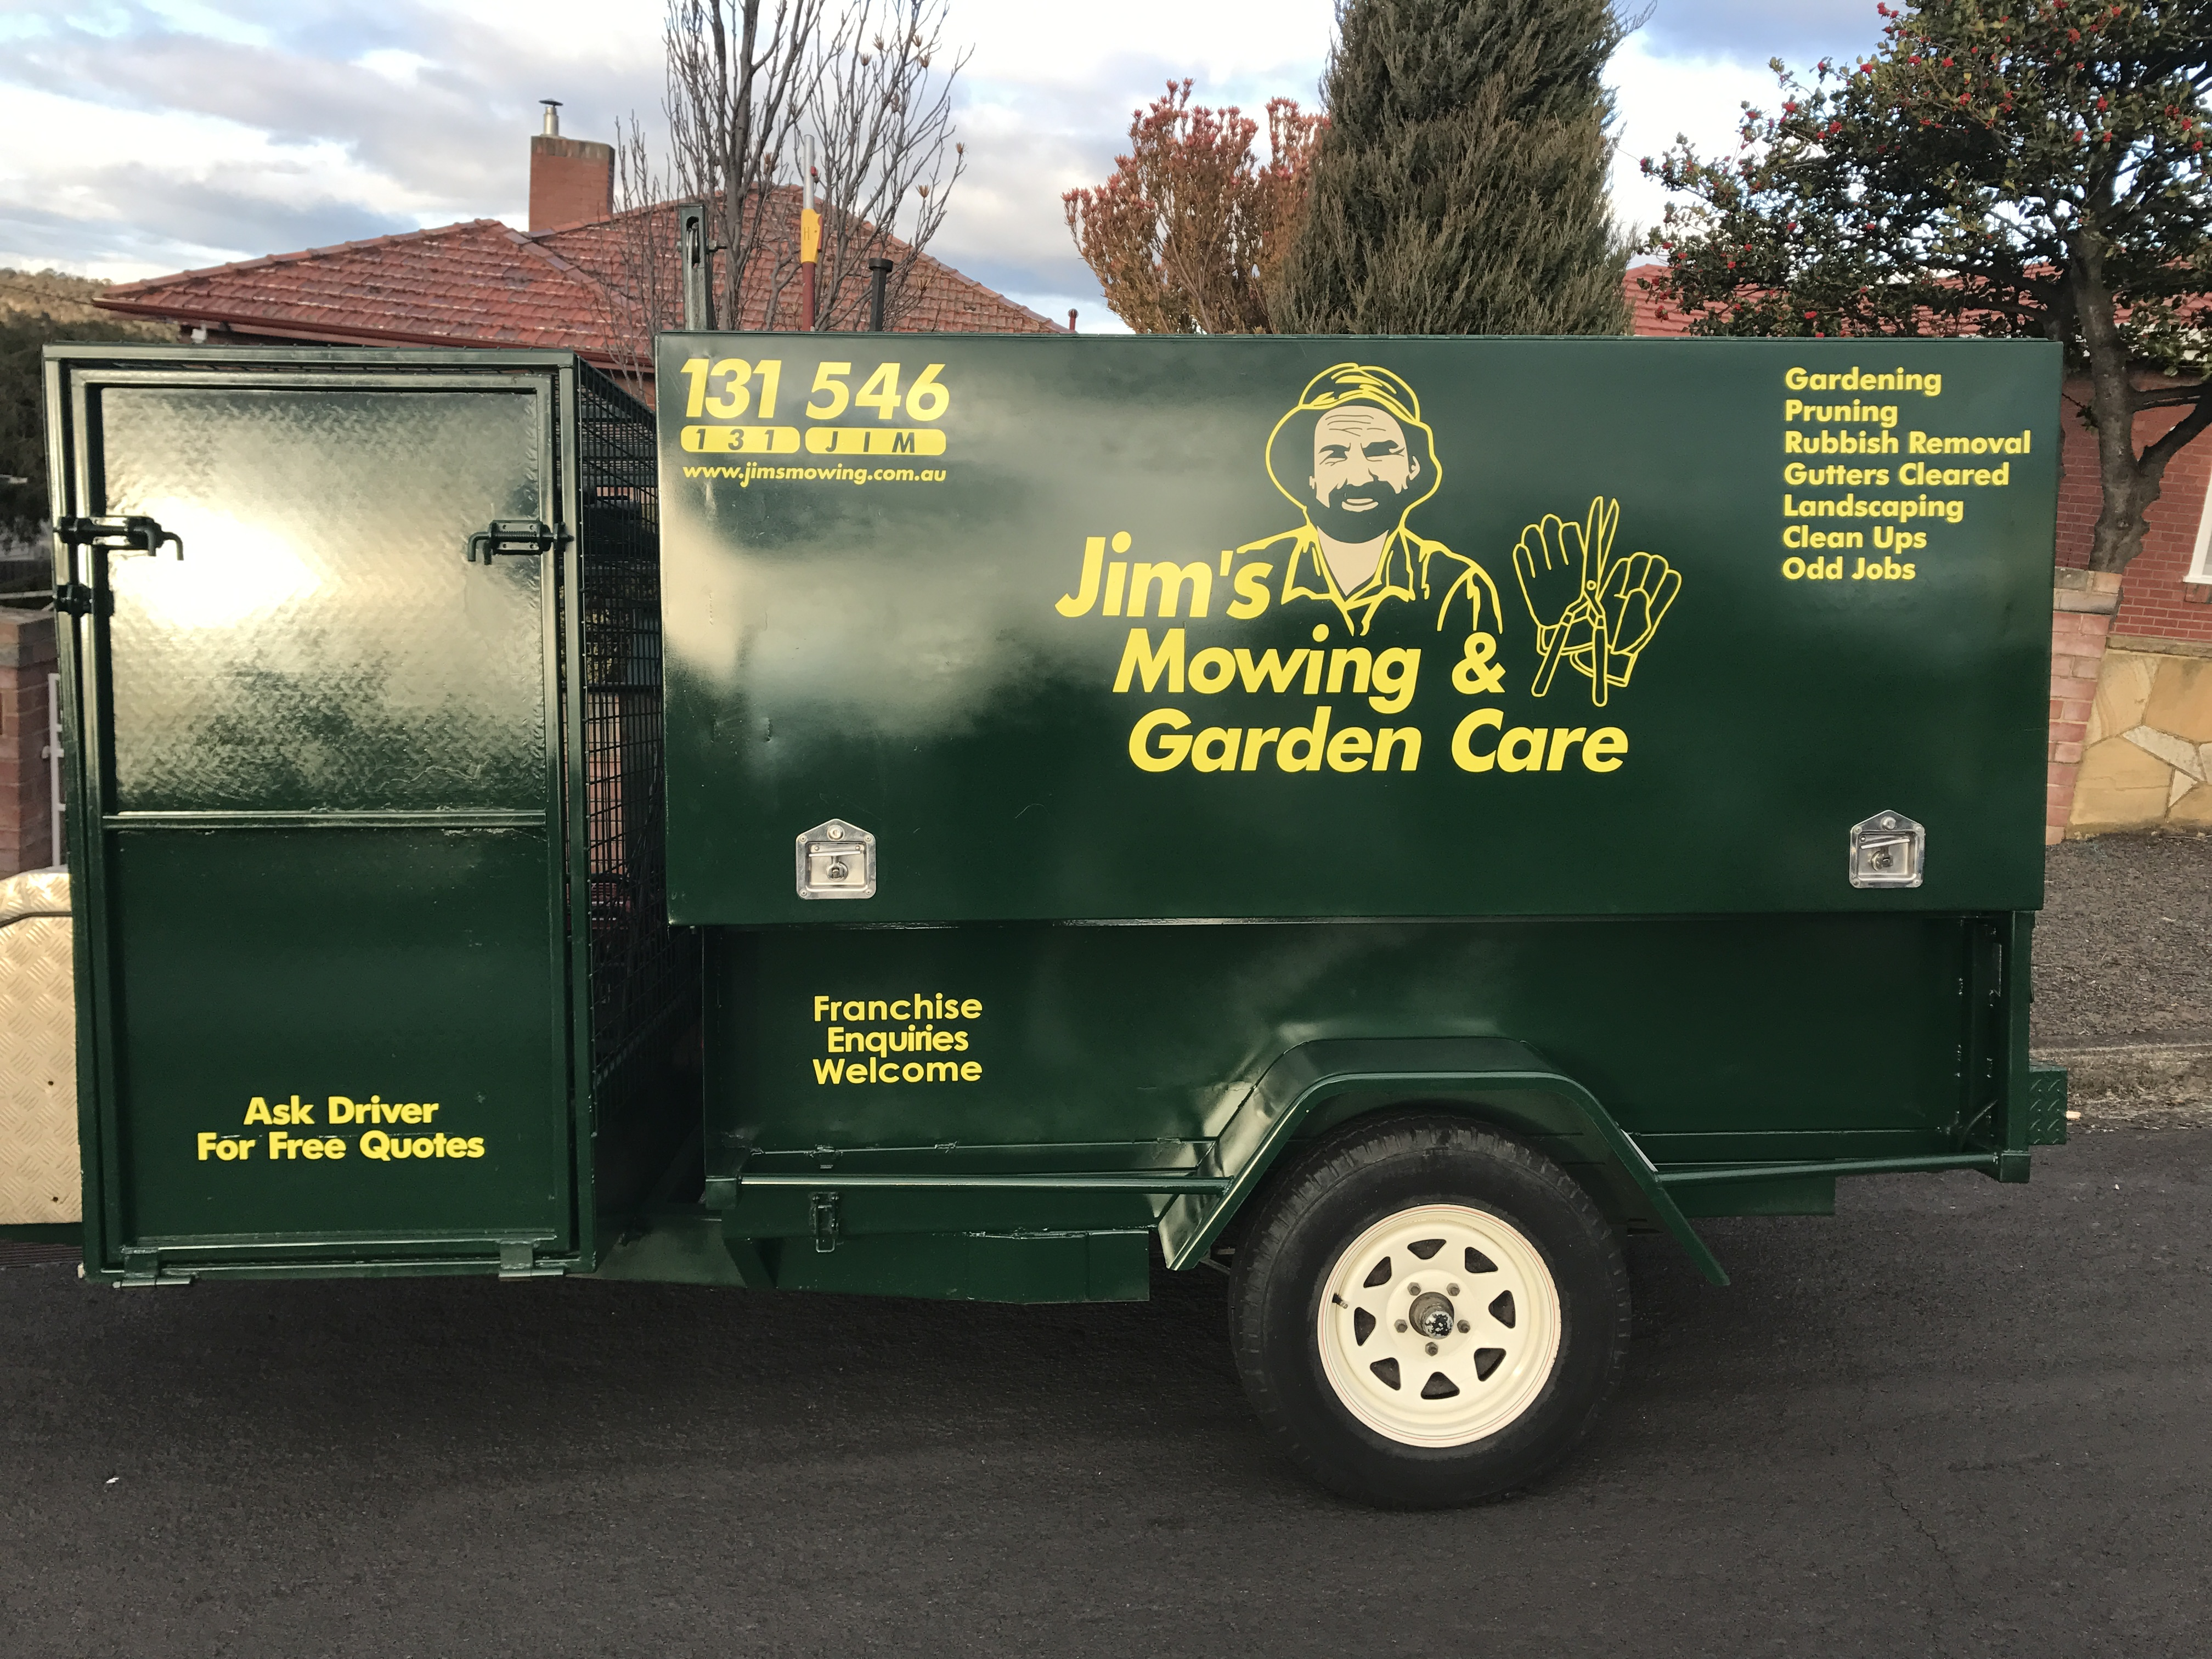 Jim's Mowing & Garden Care Franchise